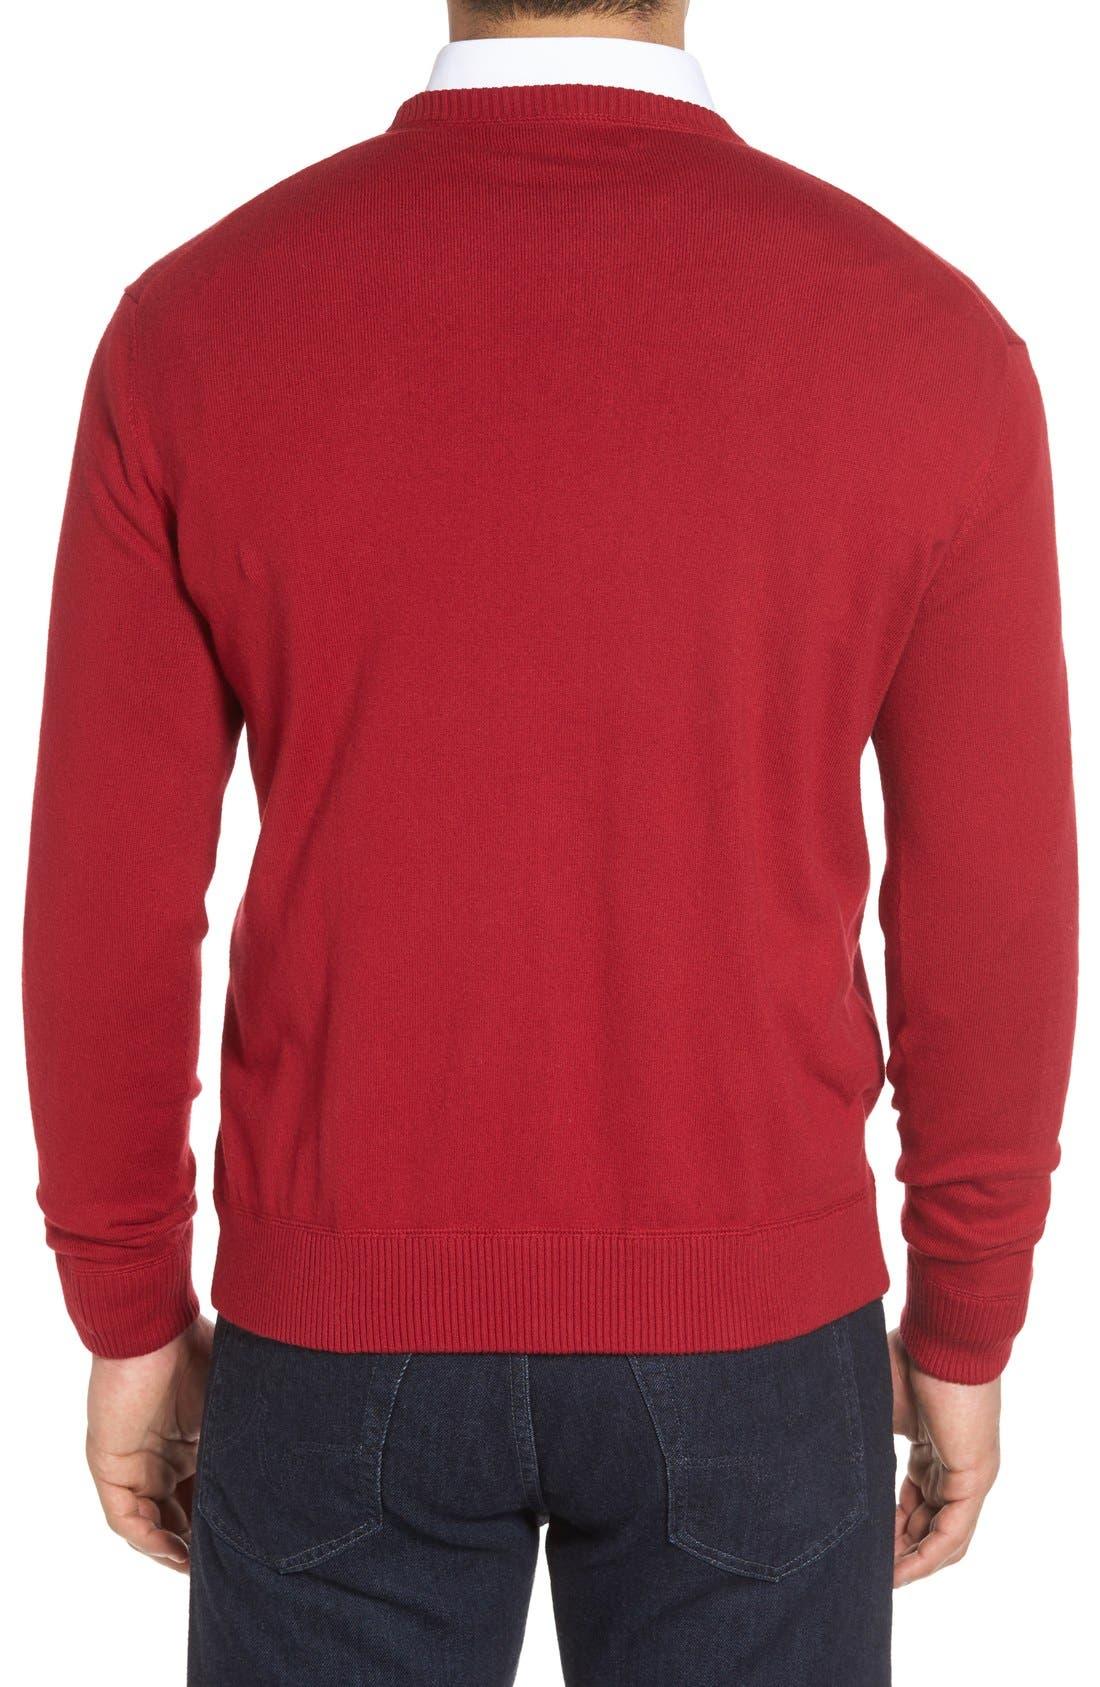 'Jersey Sport' Cotton Blend Crewneck Sweater,                             Alternate thumbnail 16, color,